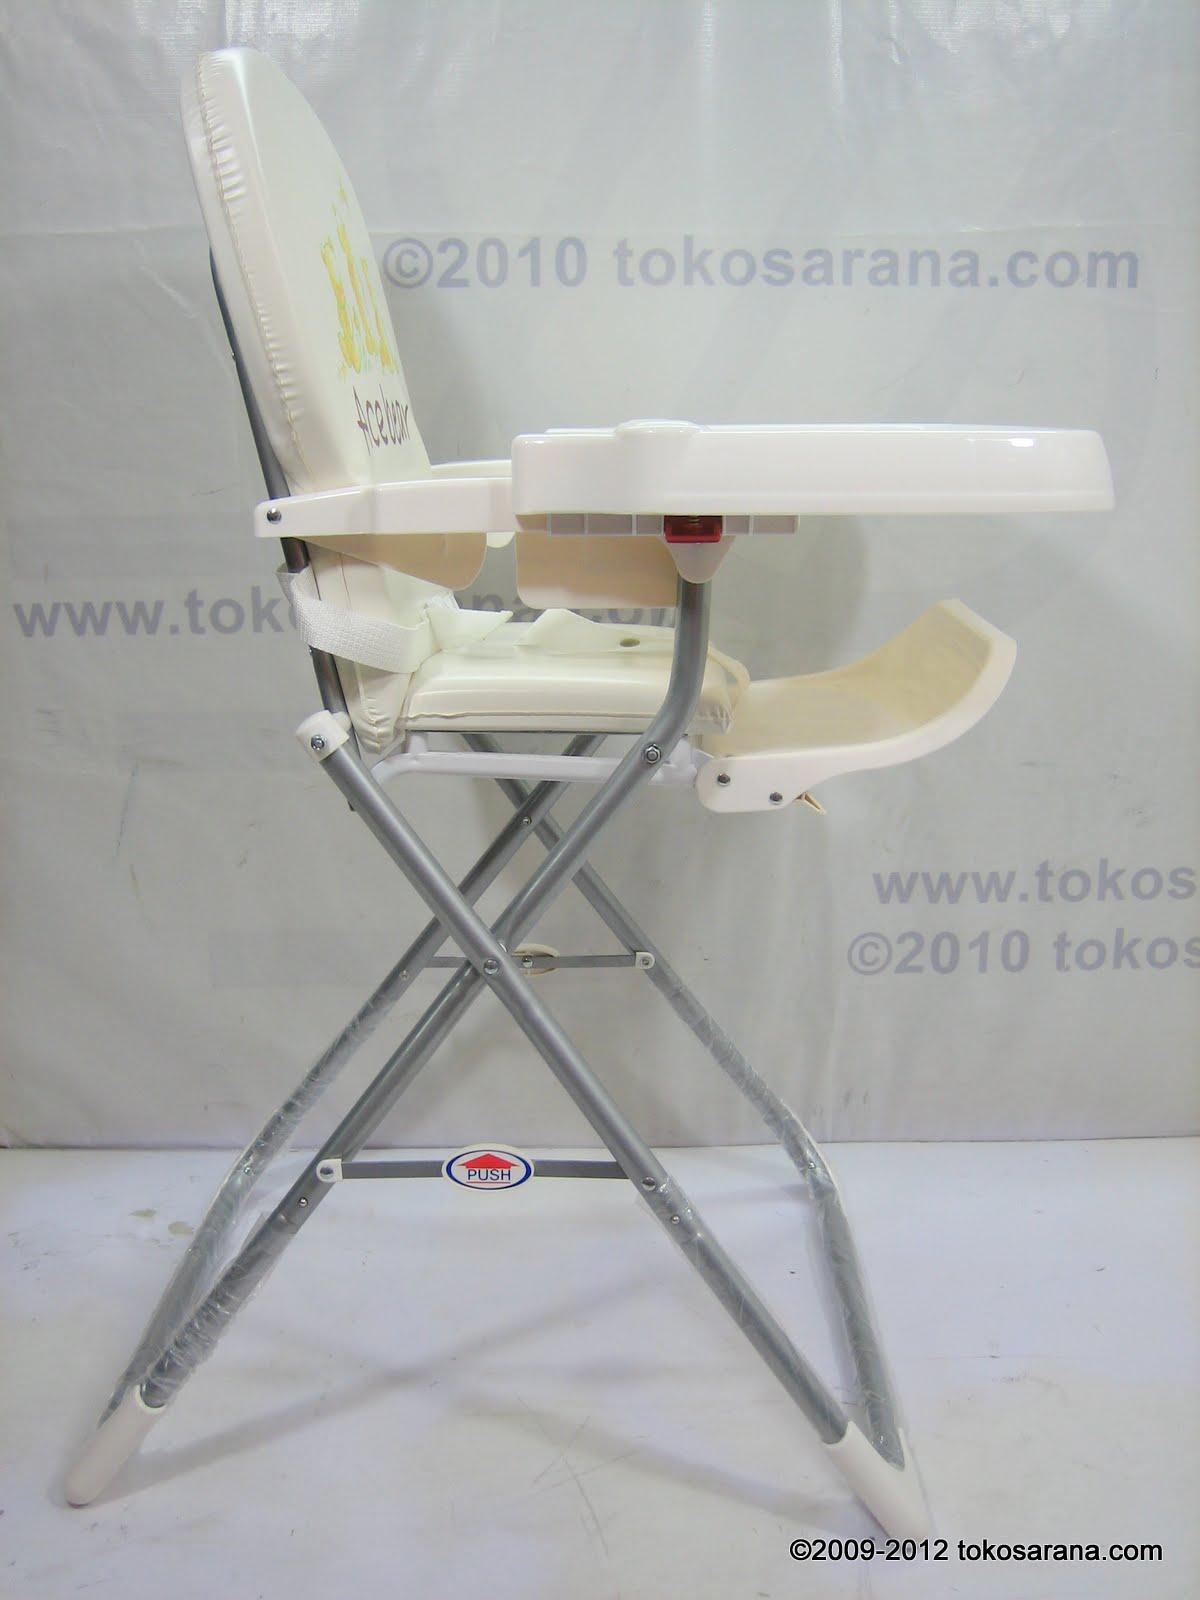 high chair that folds flat club chairs leather swivel clearance sale sepeda mainan anak dan perlengkapan bayi